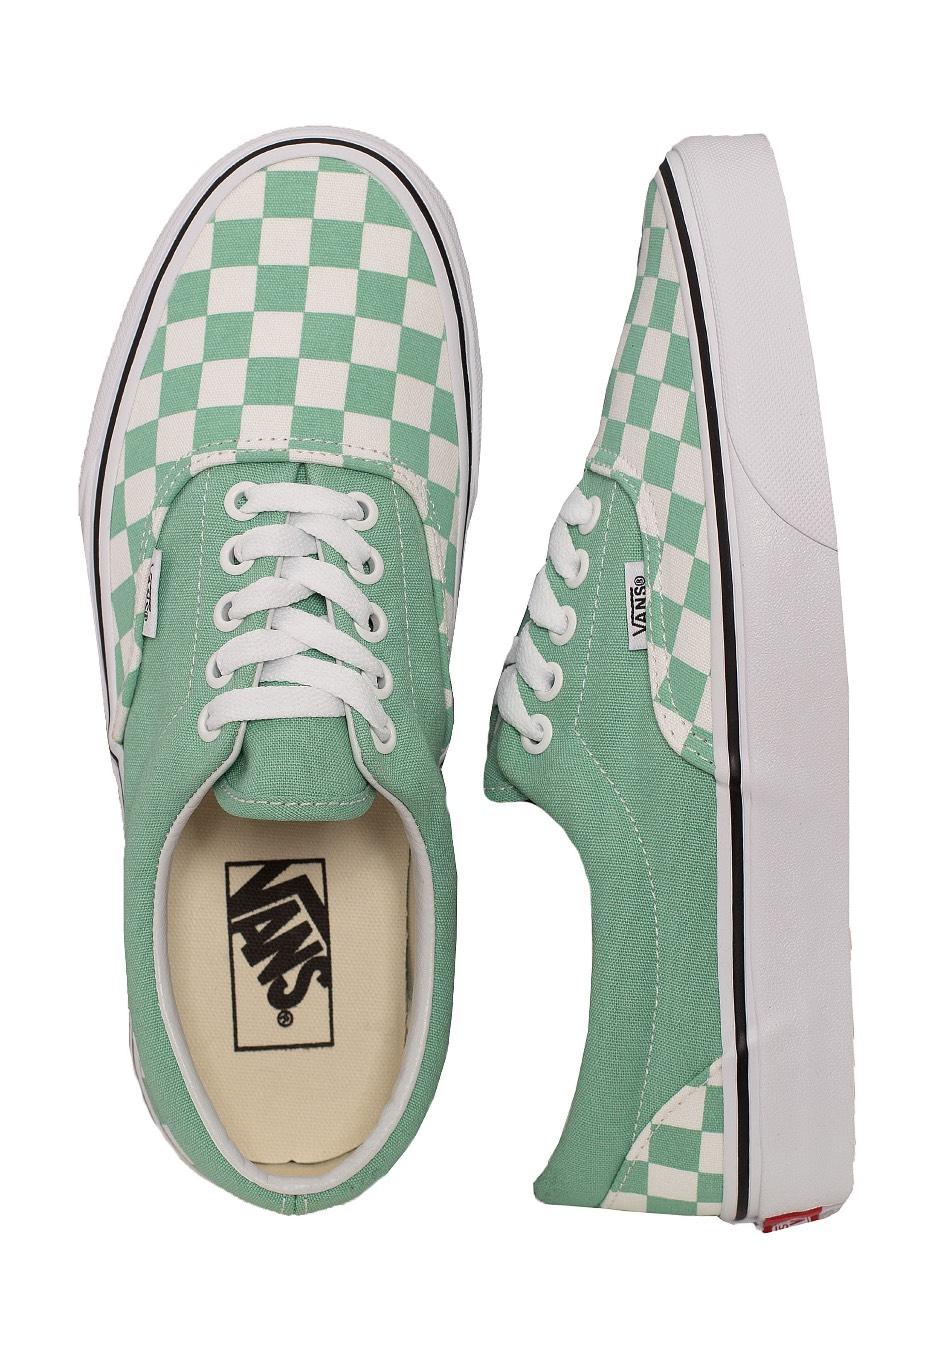 Vans - Era Checkerboard Neptune Green - Girl Shoes - Impericon.com US b47efe407